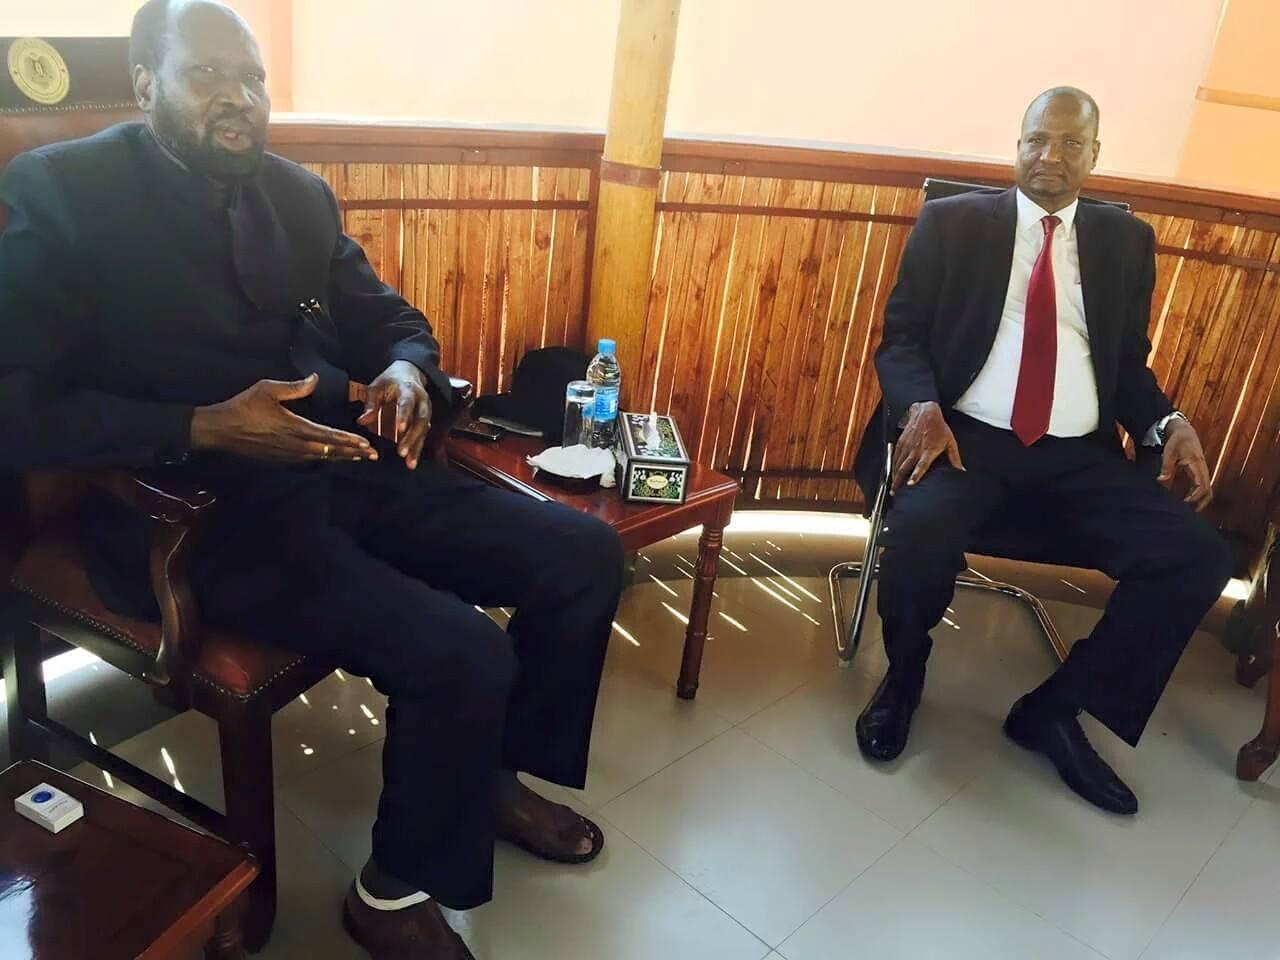 President Salva Kiir and his FVP, Taban Deng Gai having good moments before the sanctions kick in(Photo: supplied)